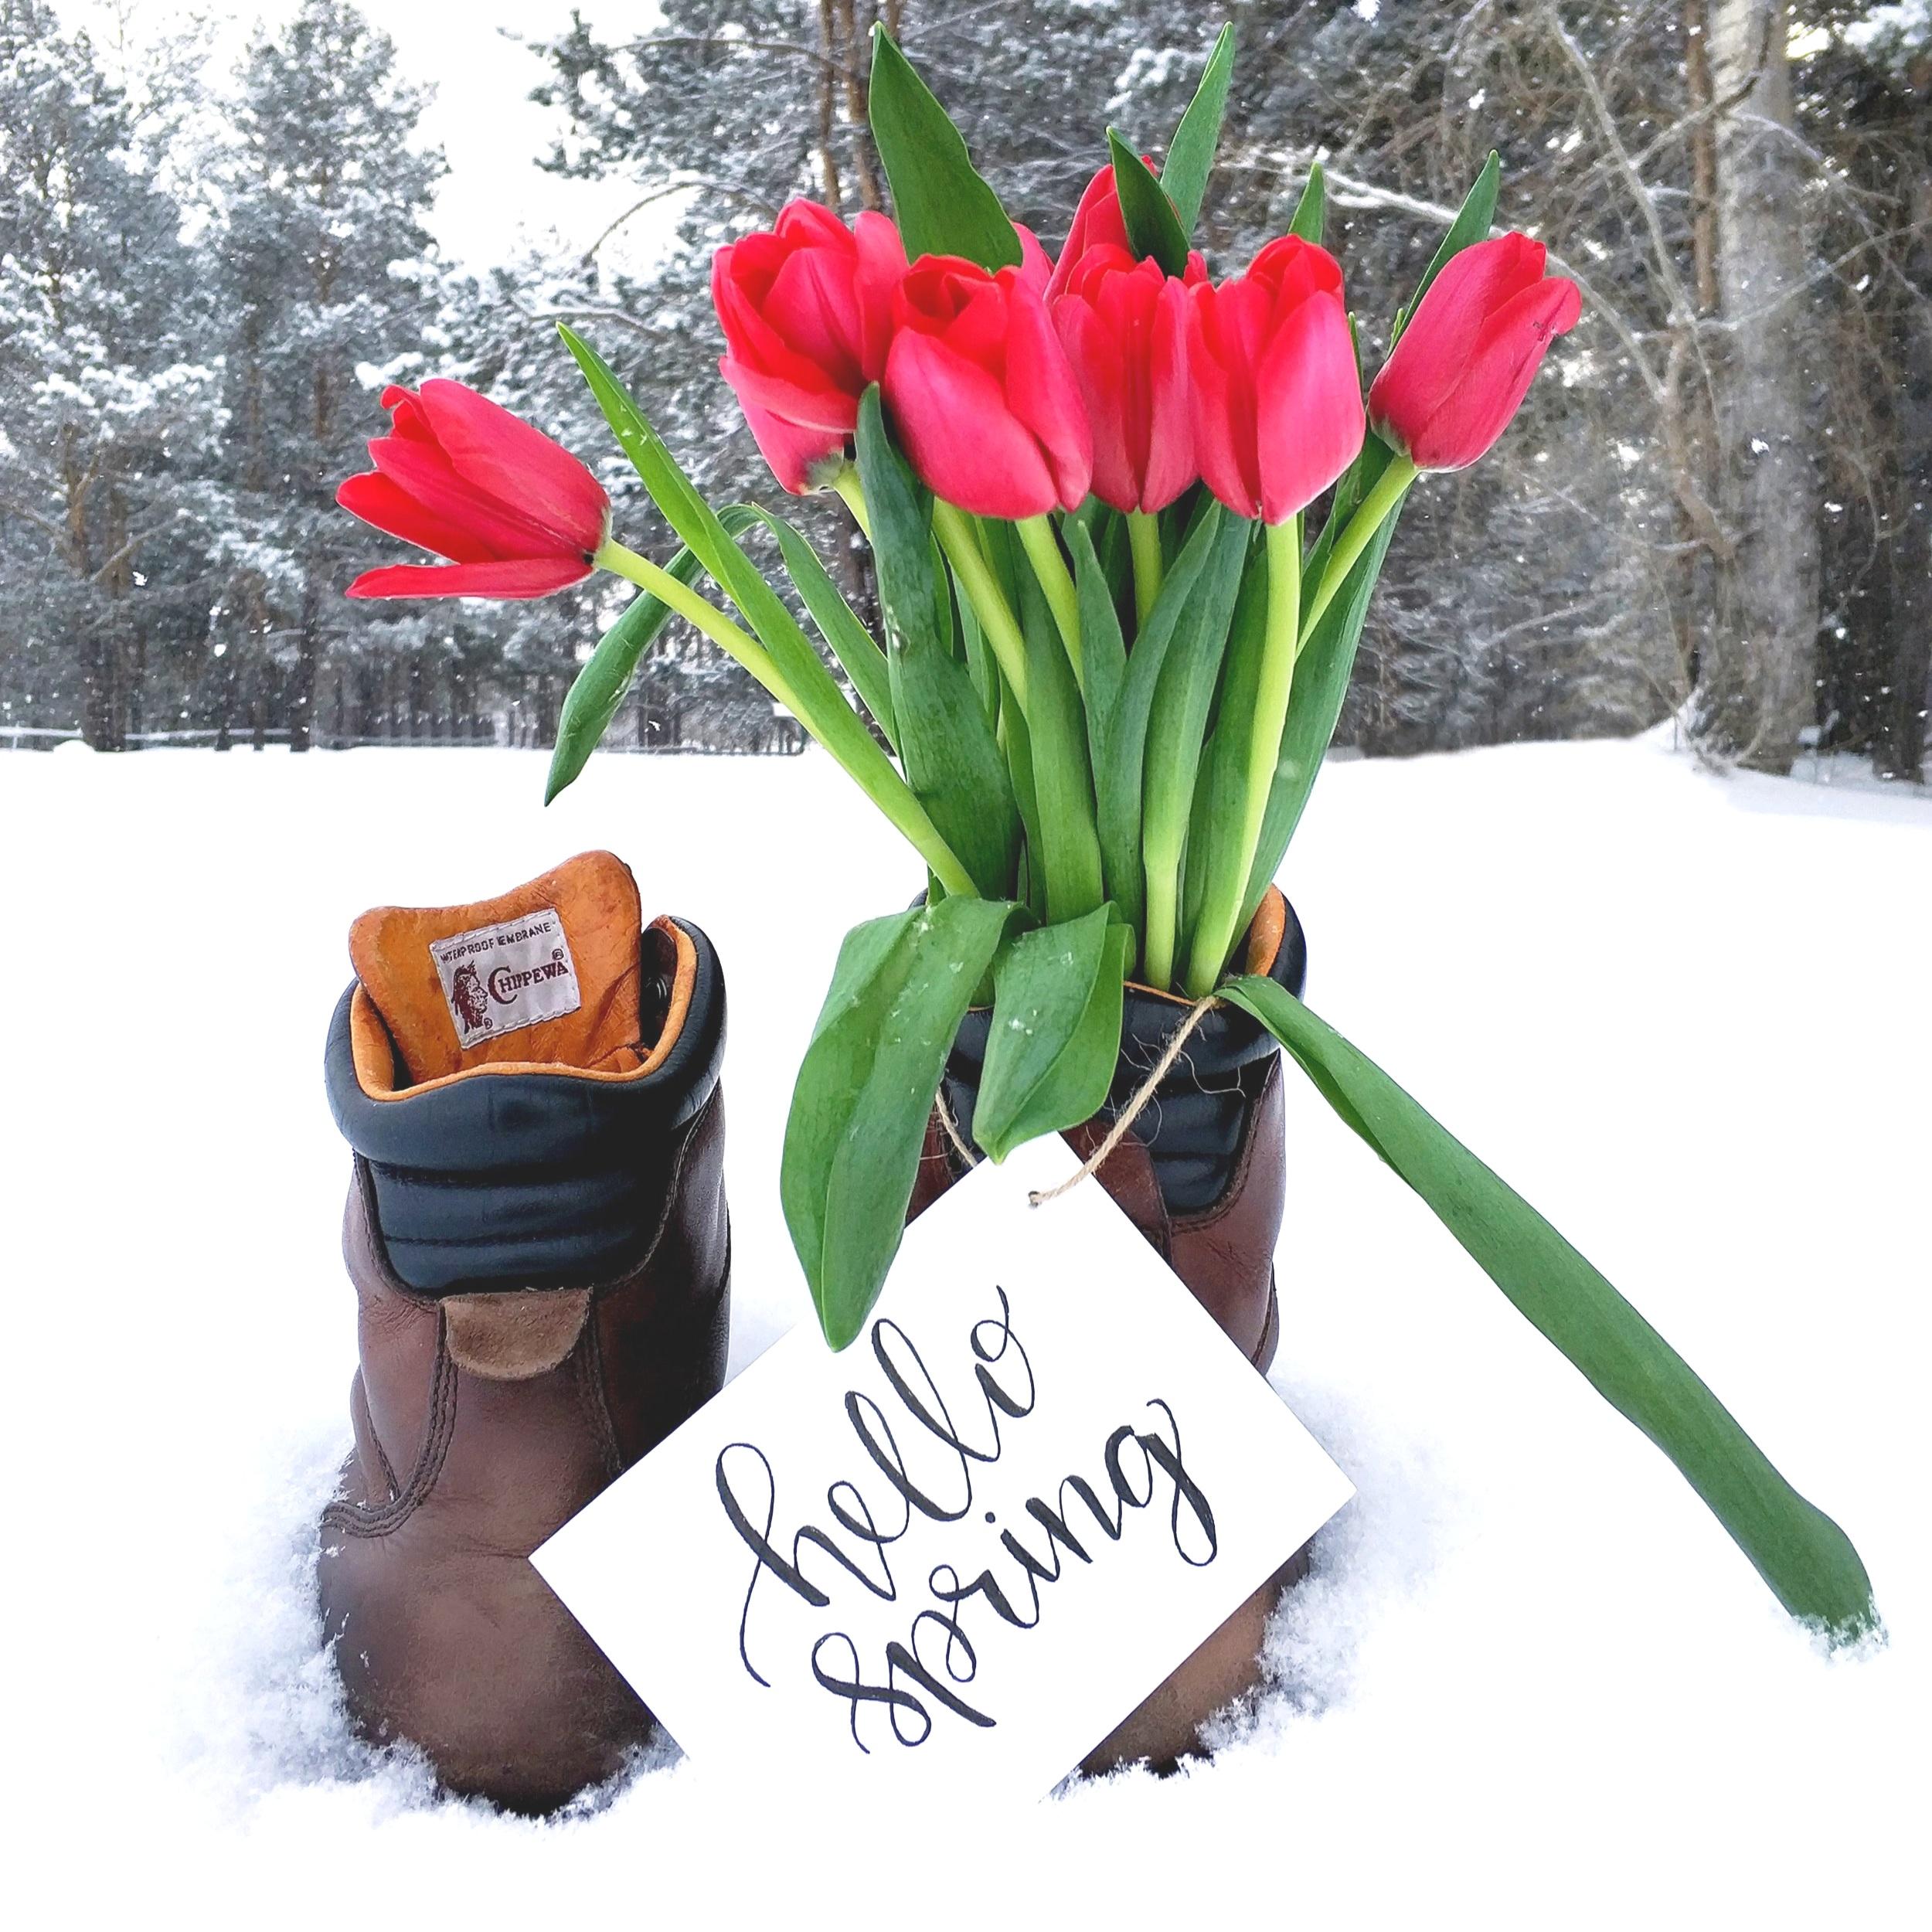 bloom-blossom-boots-908308.jpg